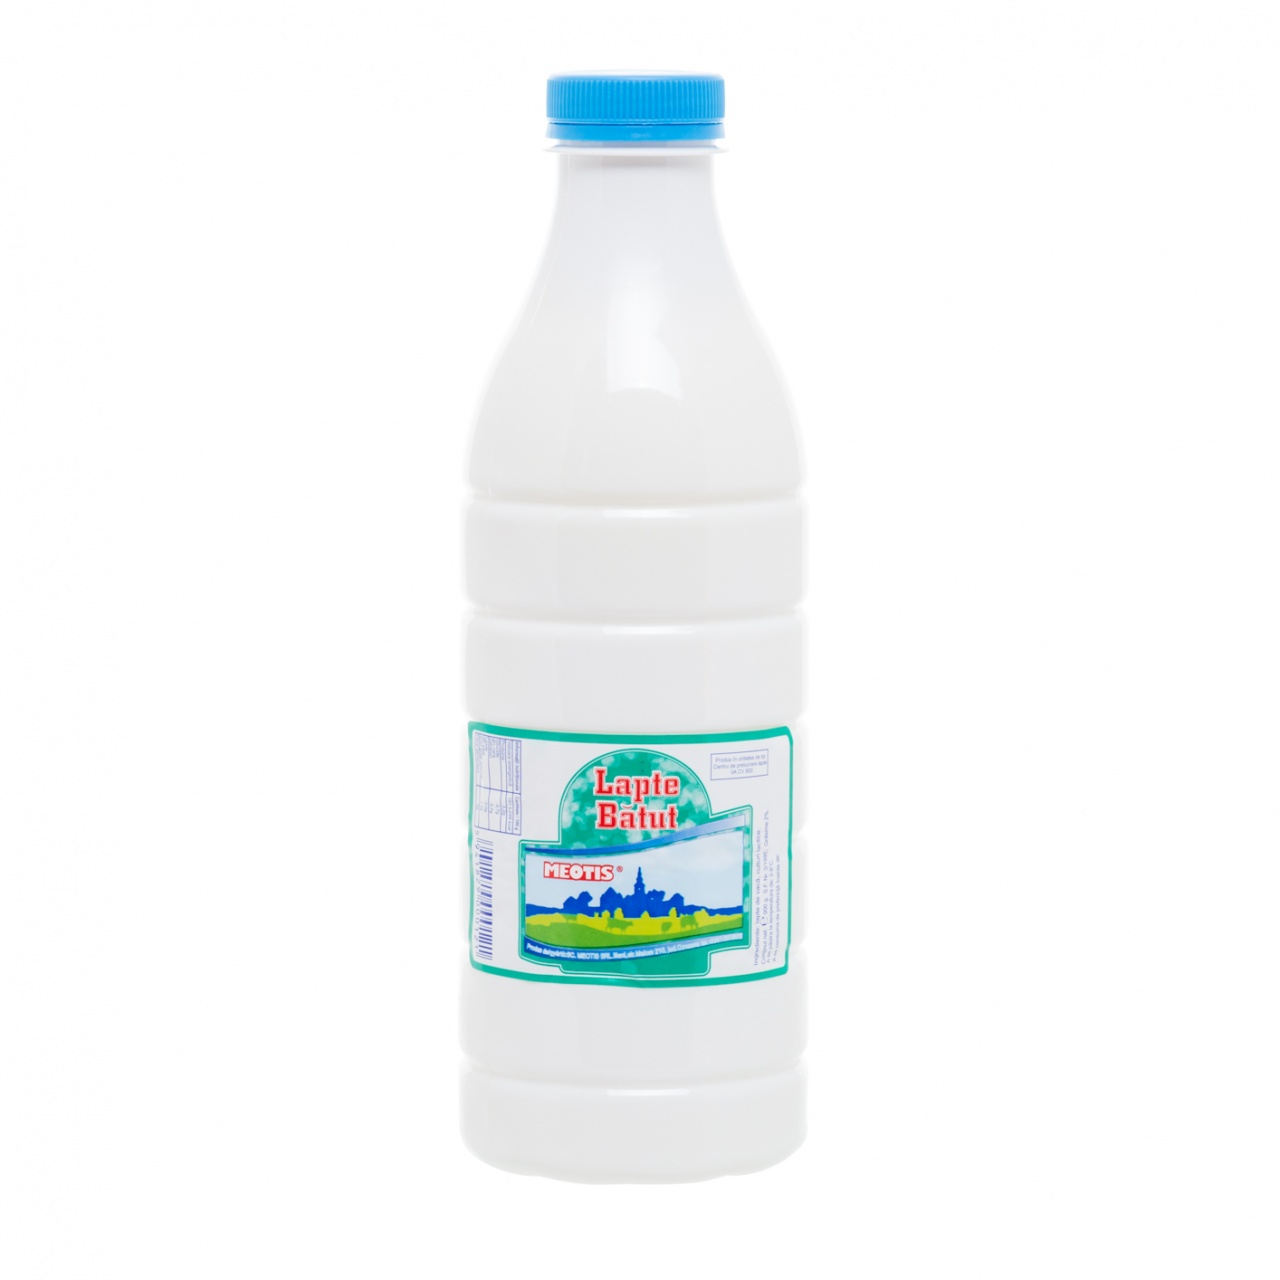 Lapte bătut 2%, 900g